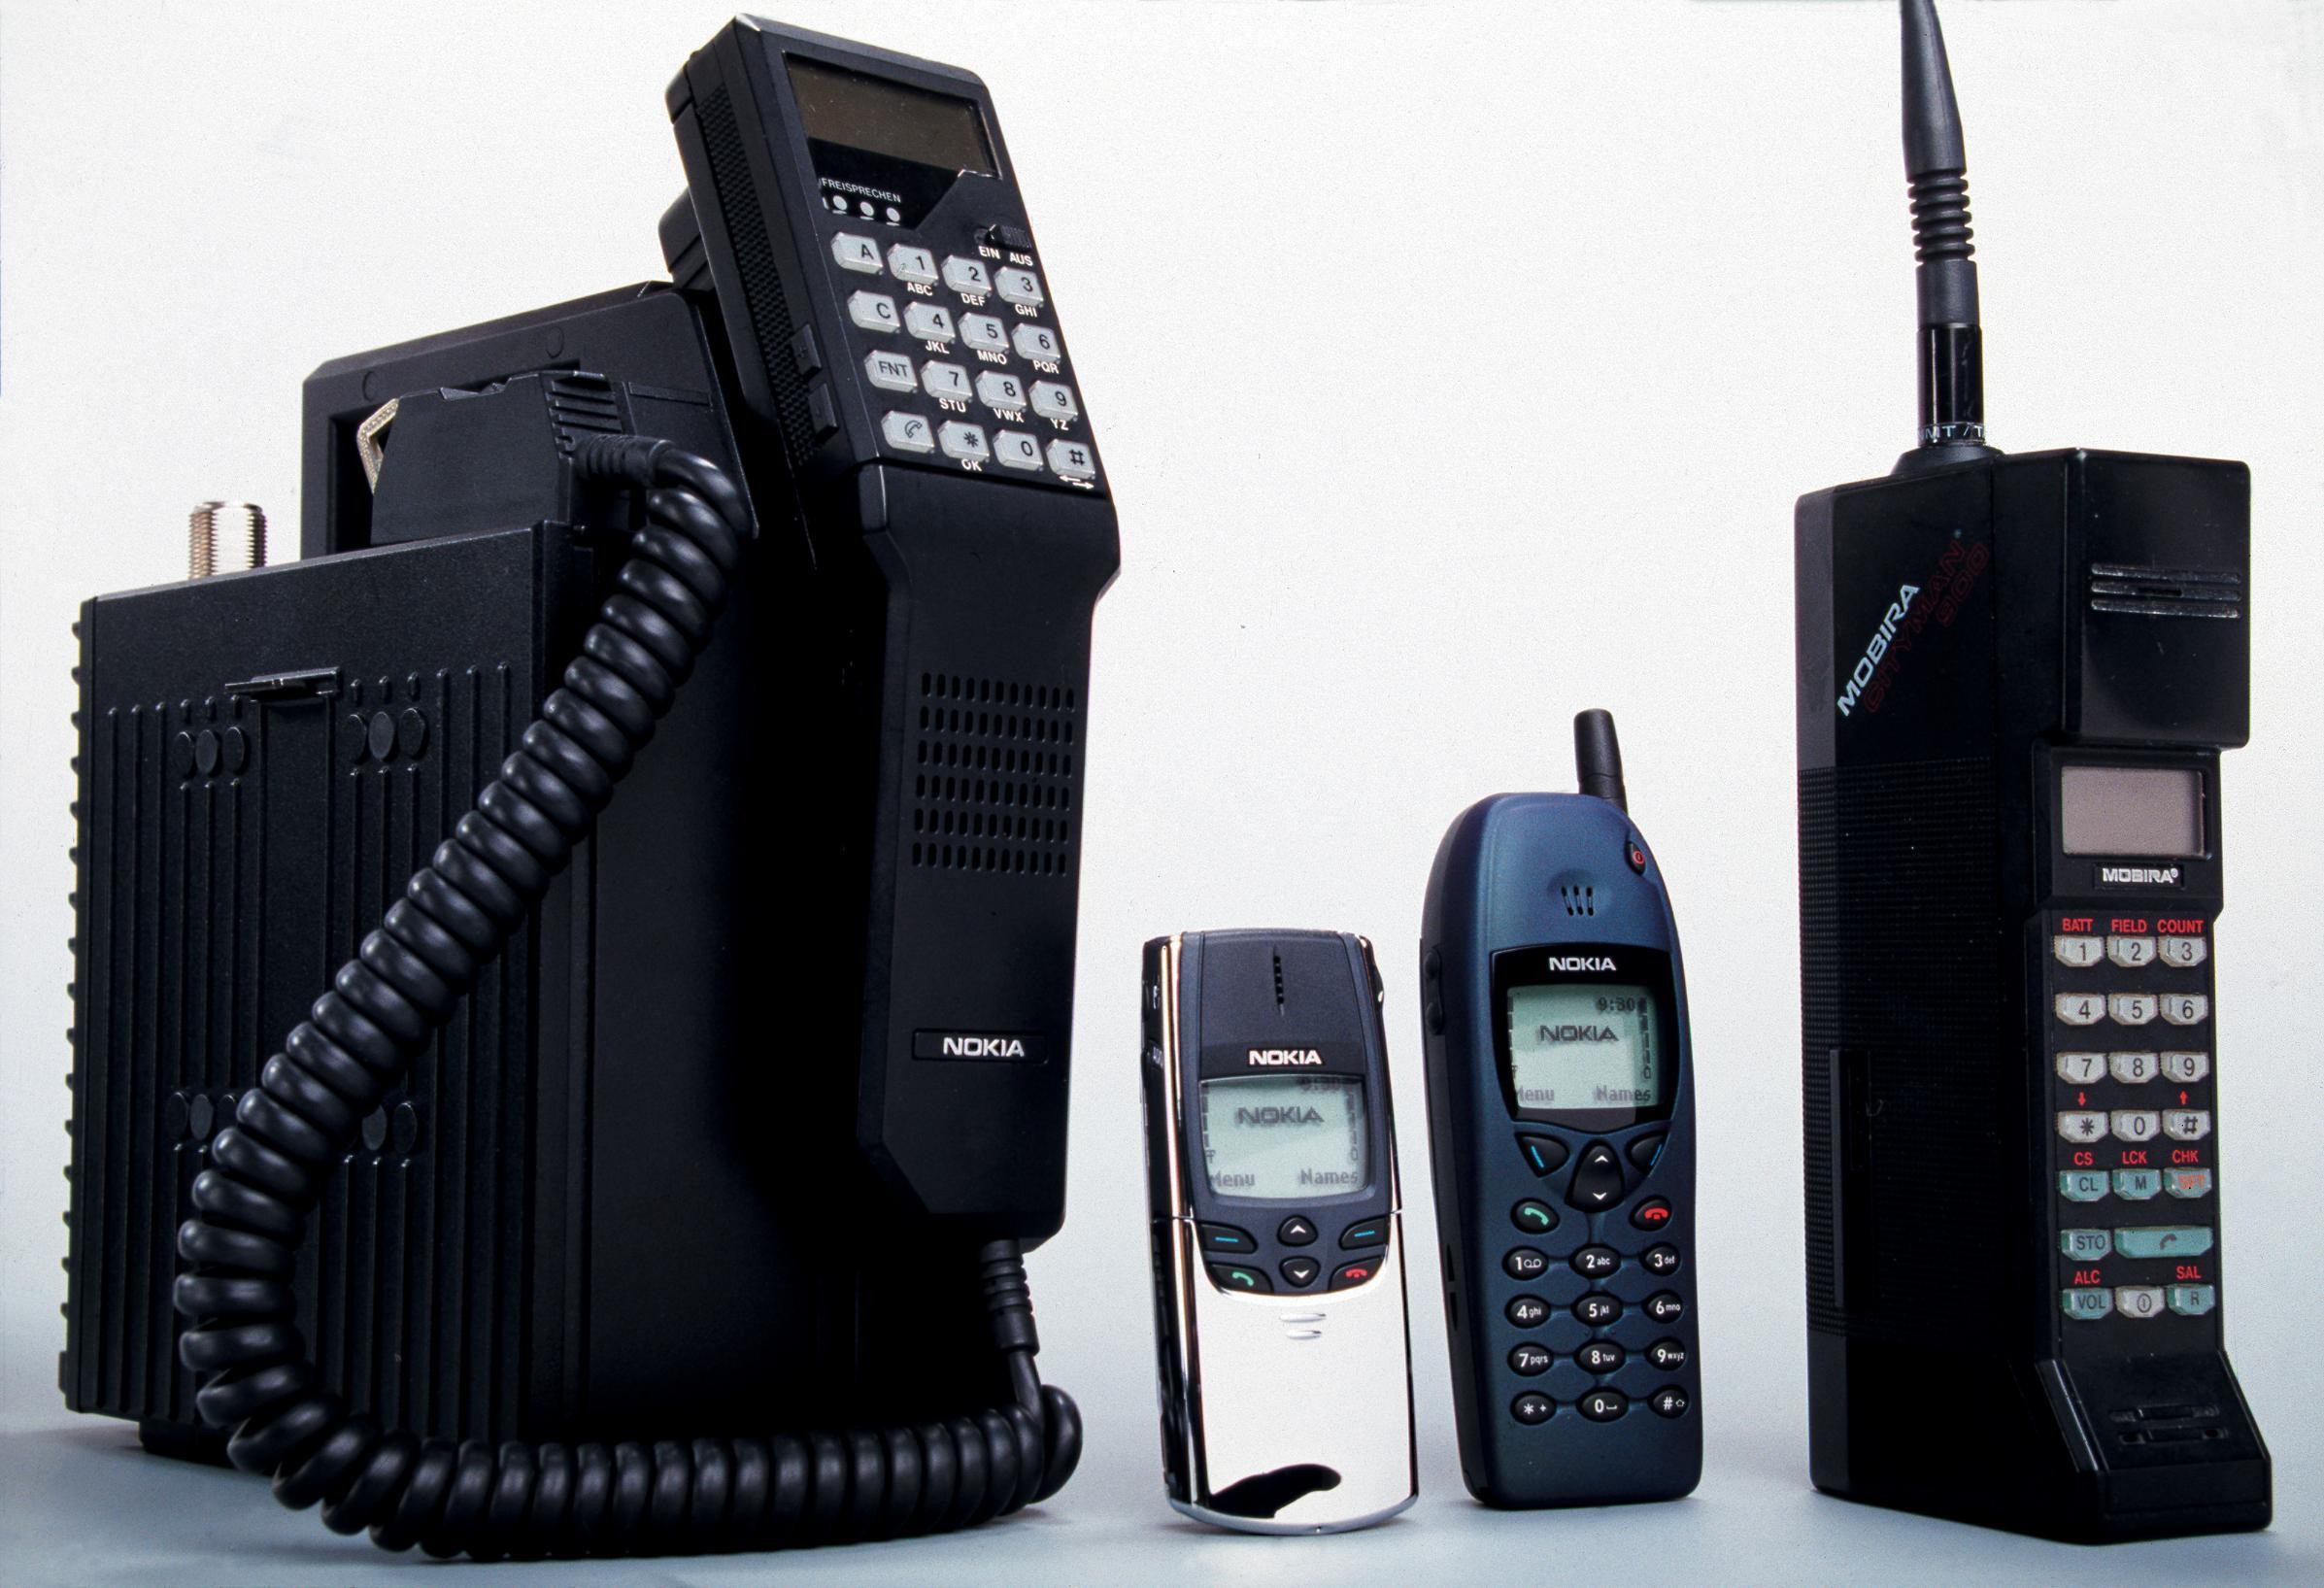 Fra venstre: Mobira Talkman, Nokia 8810, Nokia 6110 og Mobira Cityman.